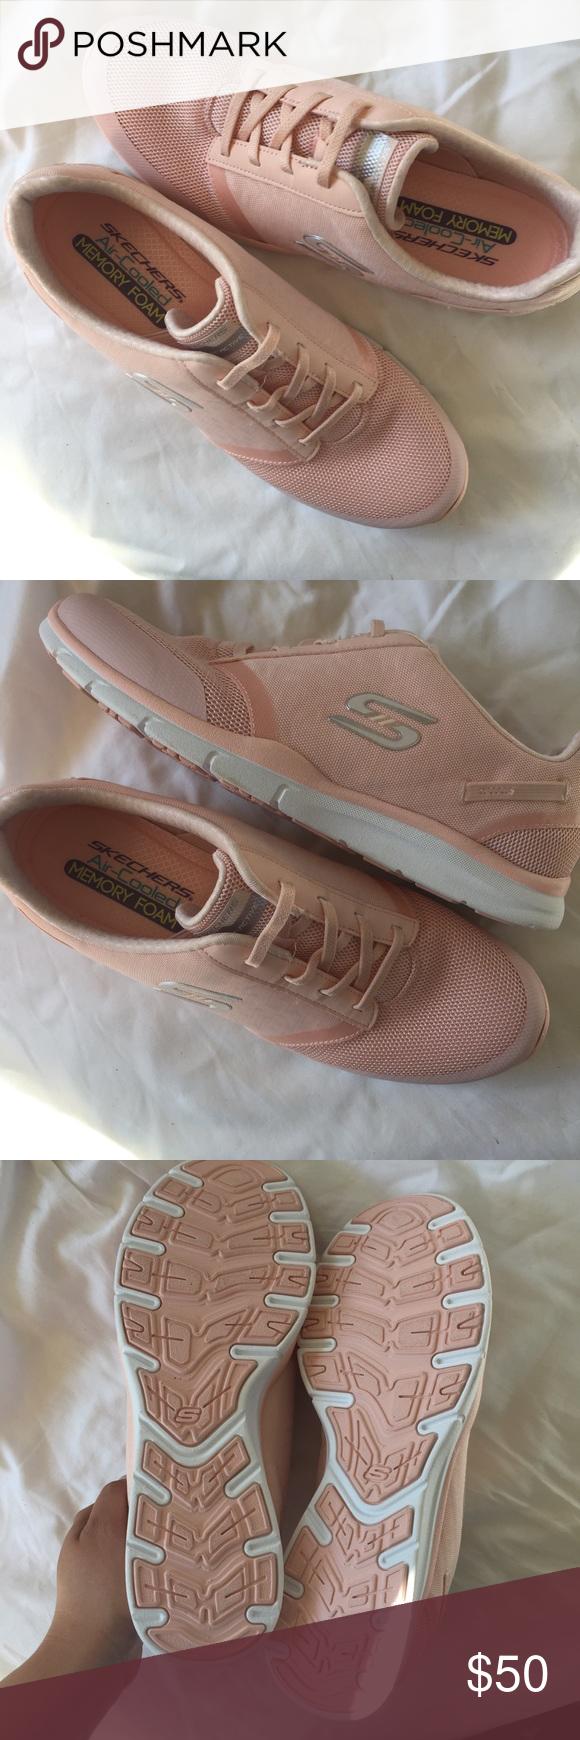 skechers peach